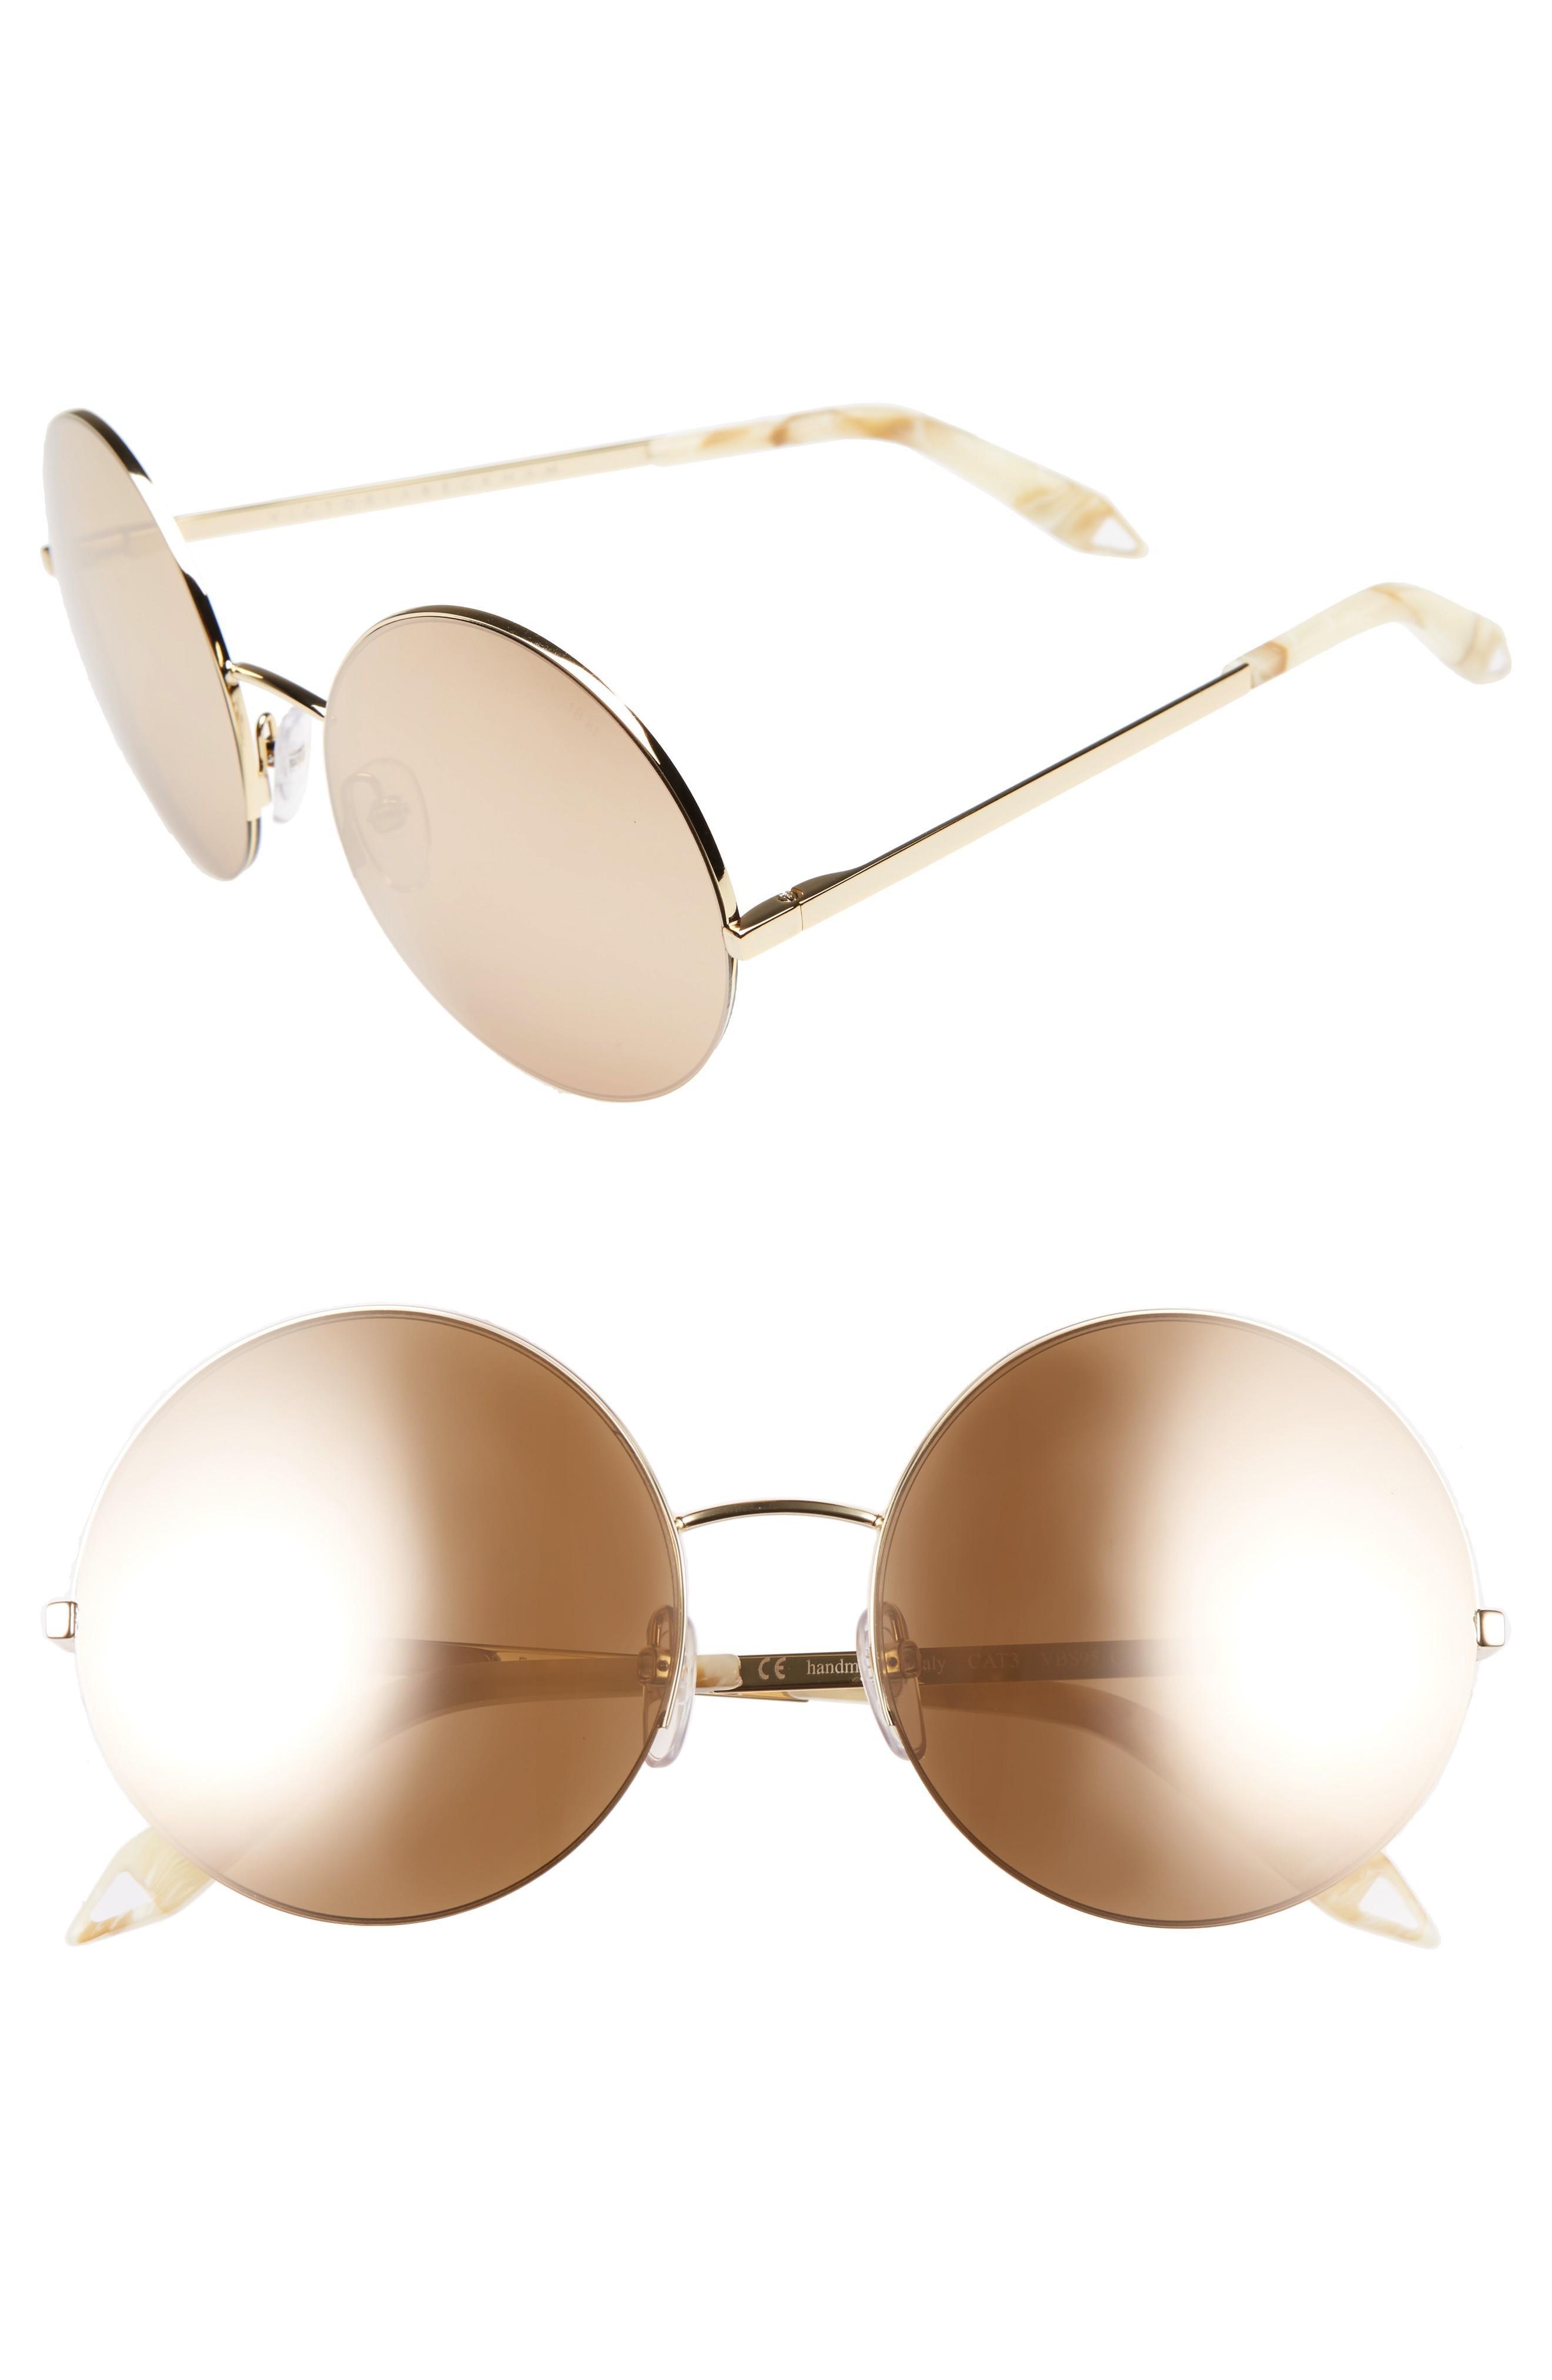 fd7c48ce8460 Victoria Beckham 56Mm Round Sunglasses - Gold Metallic  Gold Mirror ...